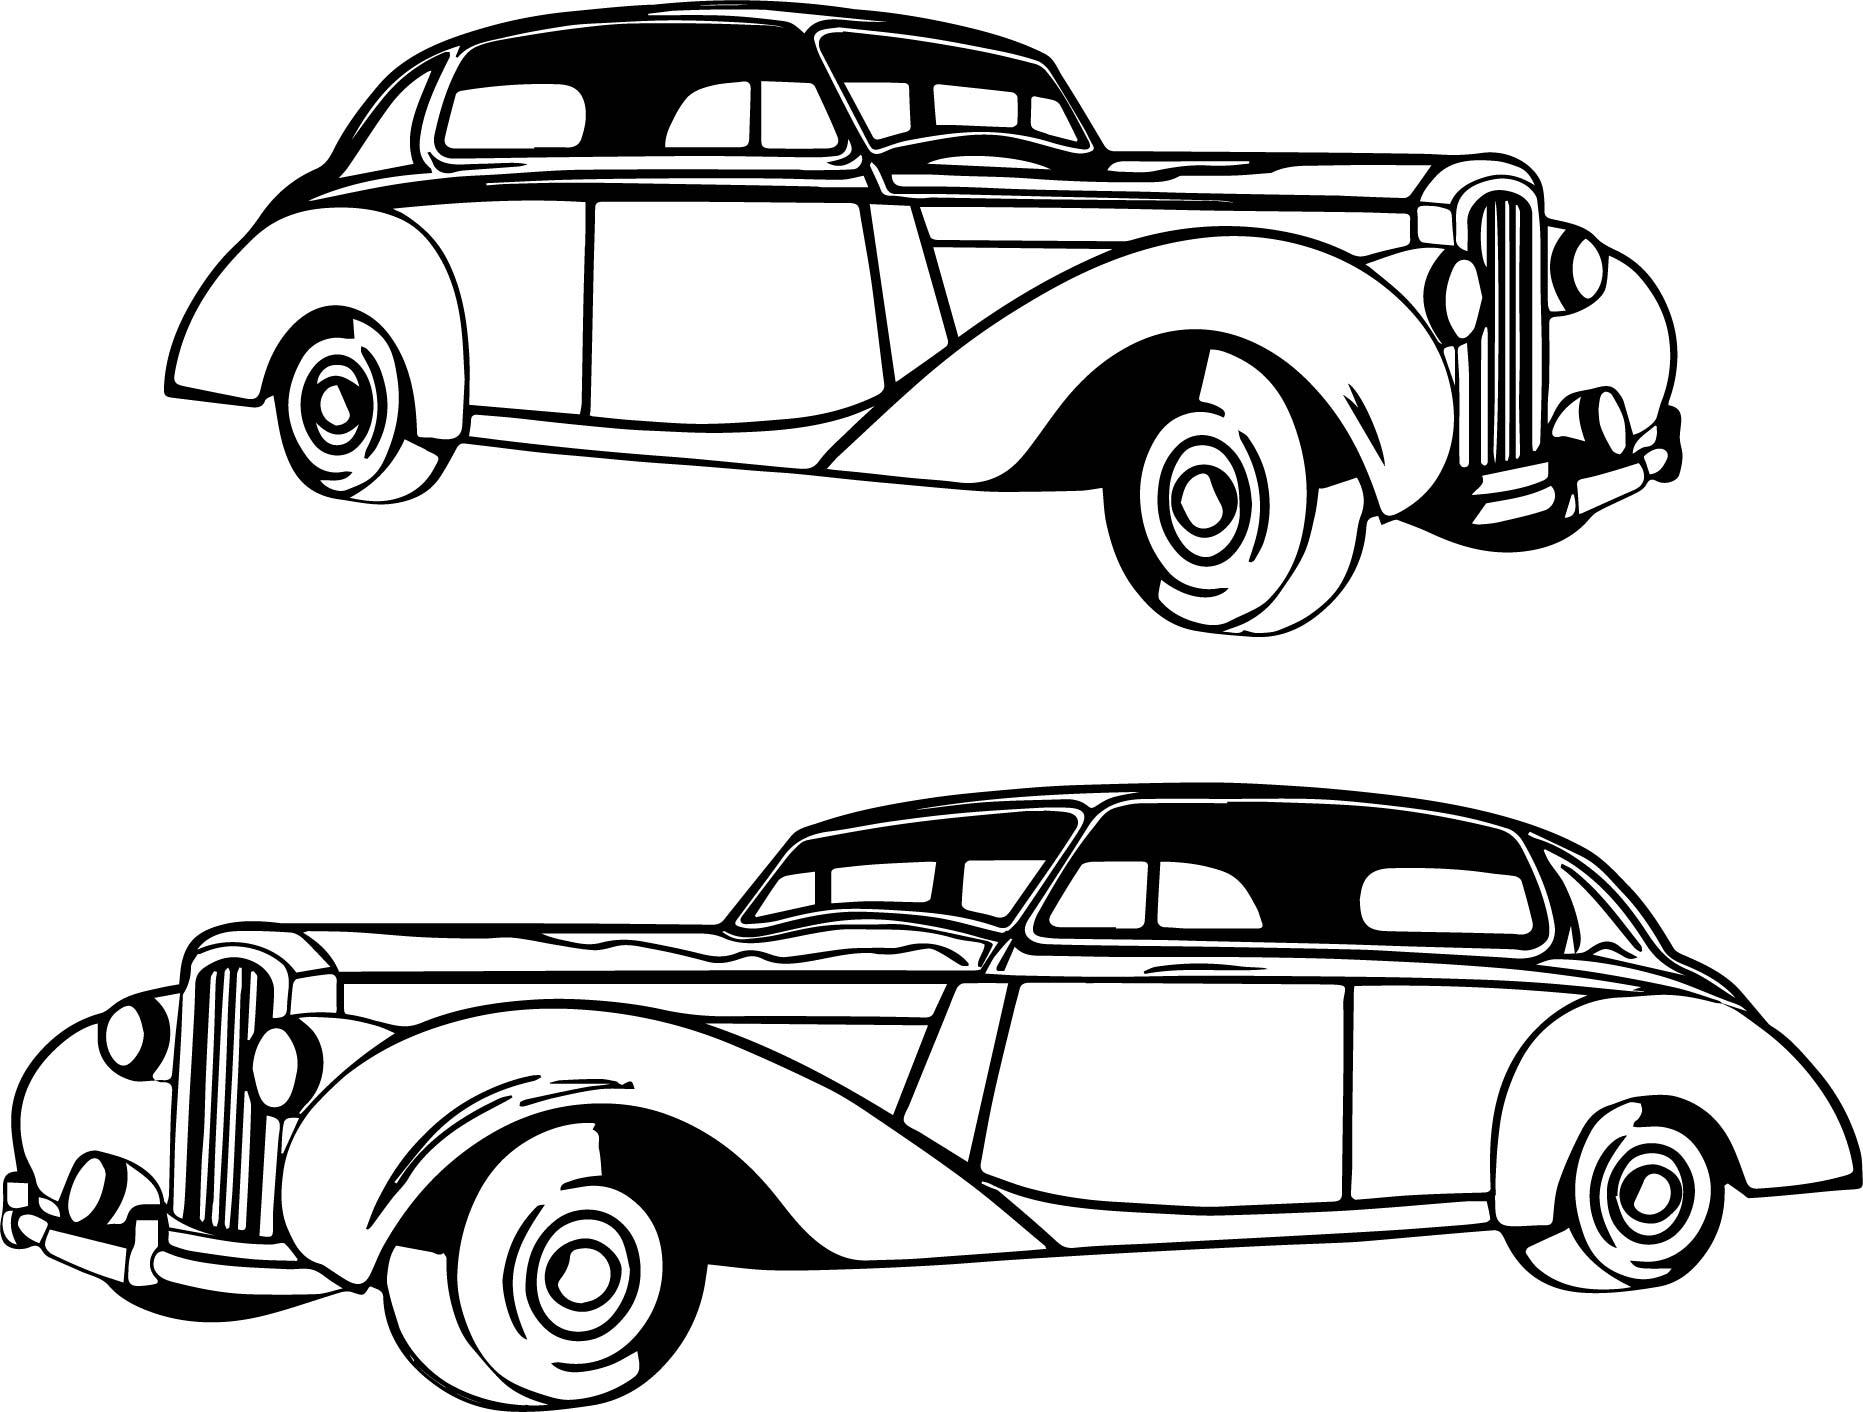 Two Vintage Antique Car Coloring Page